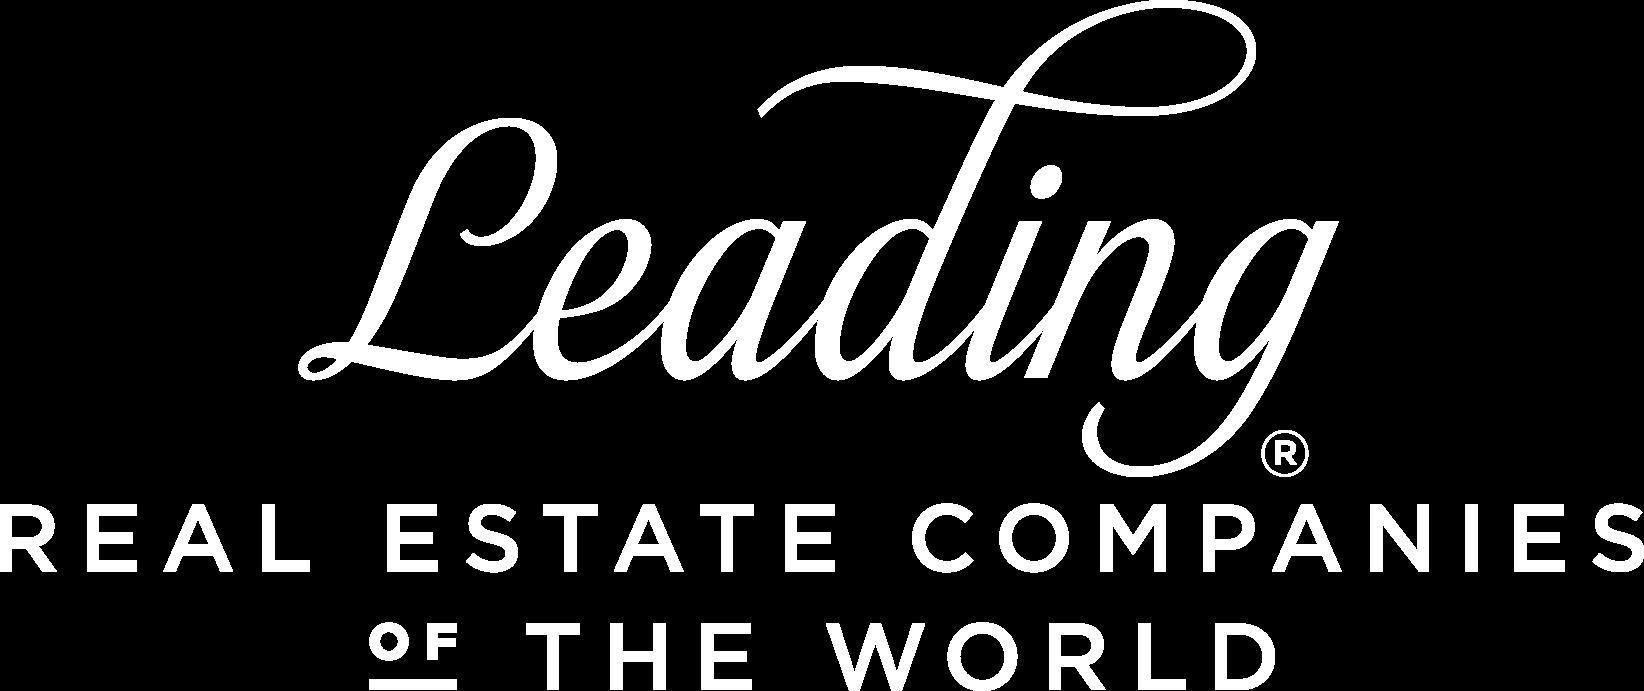 LeadingRE_Horizontal_Logo in White